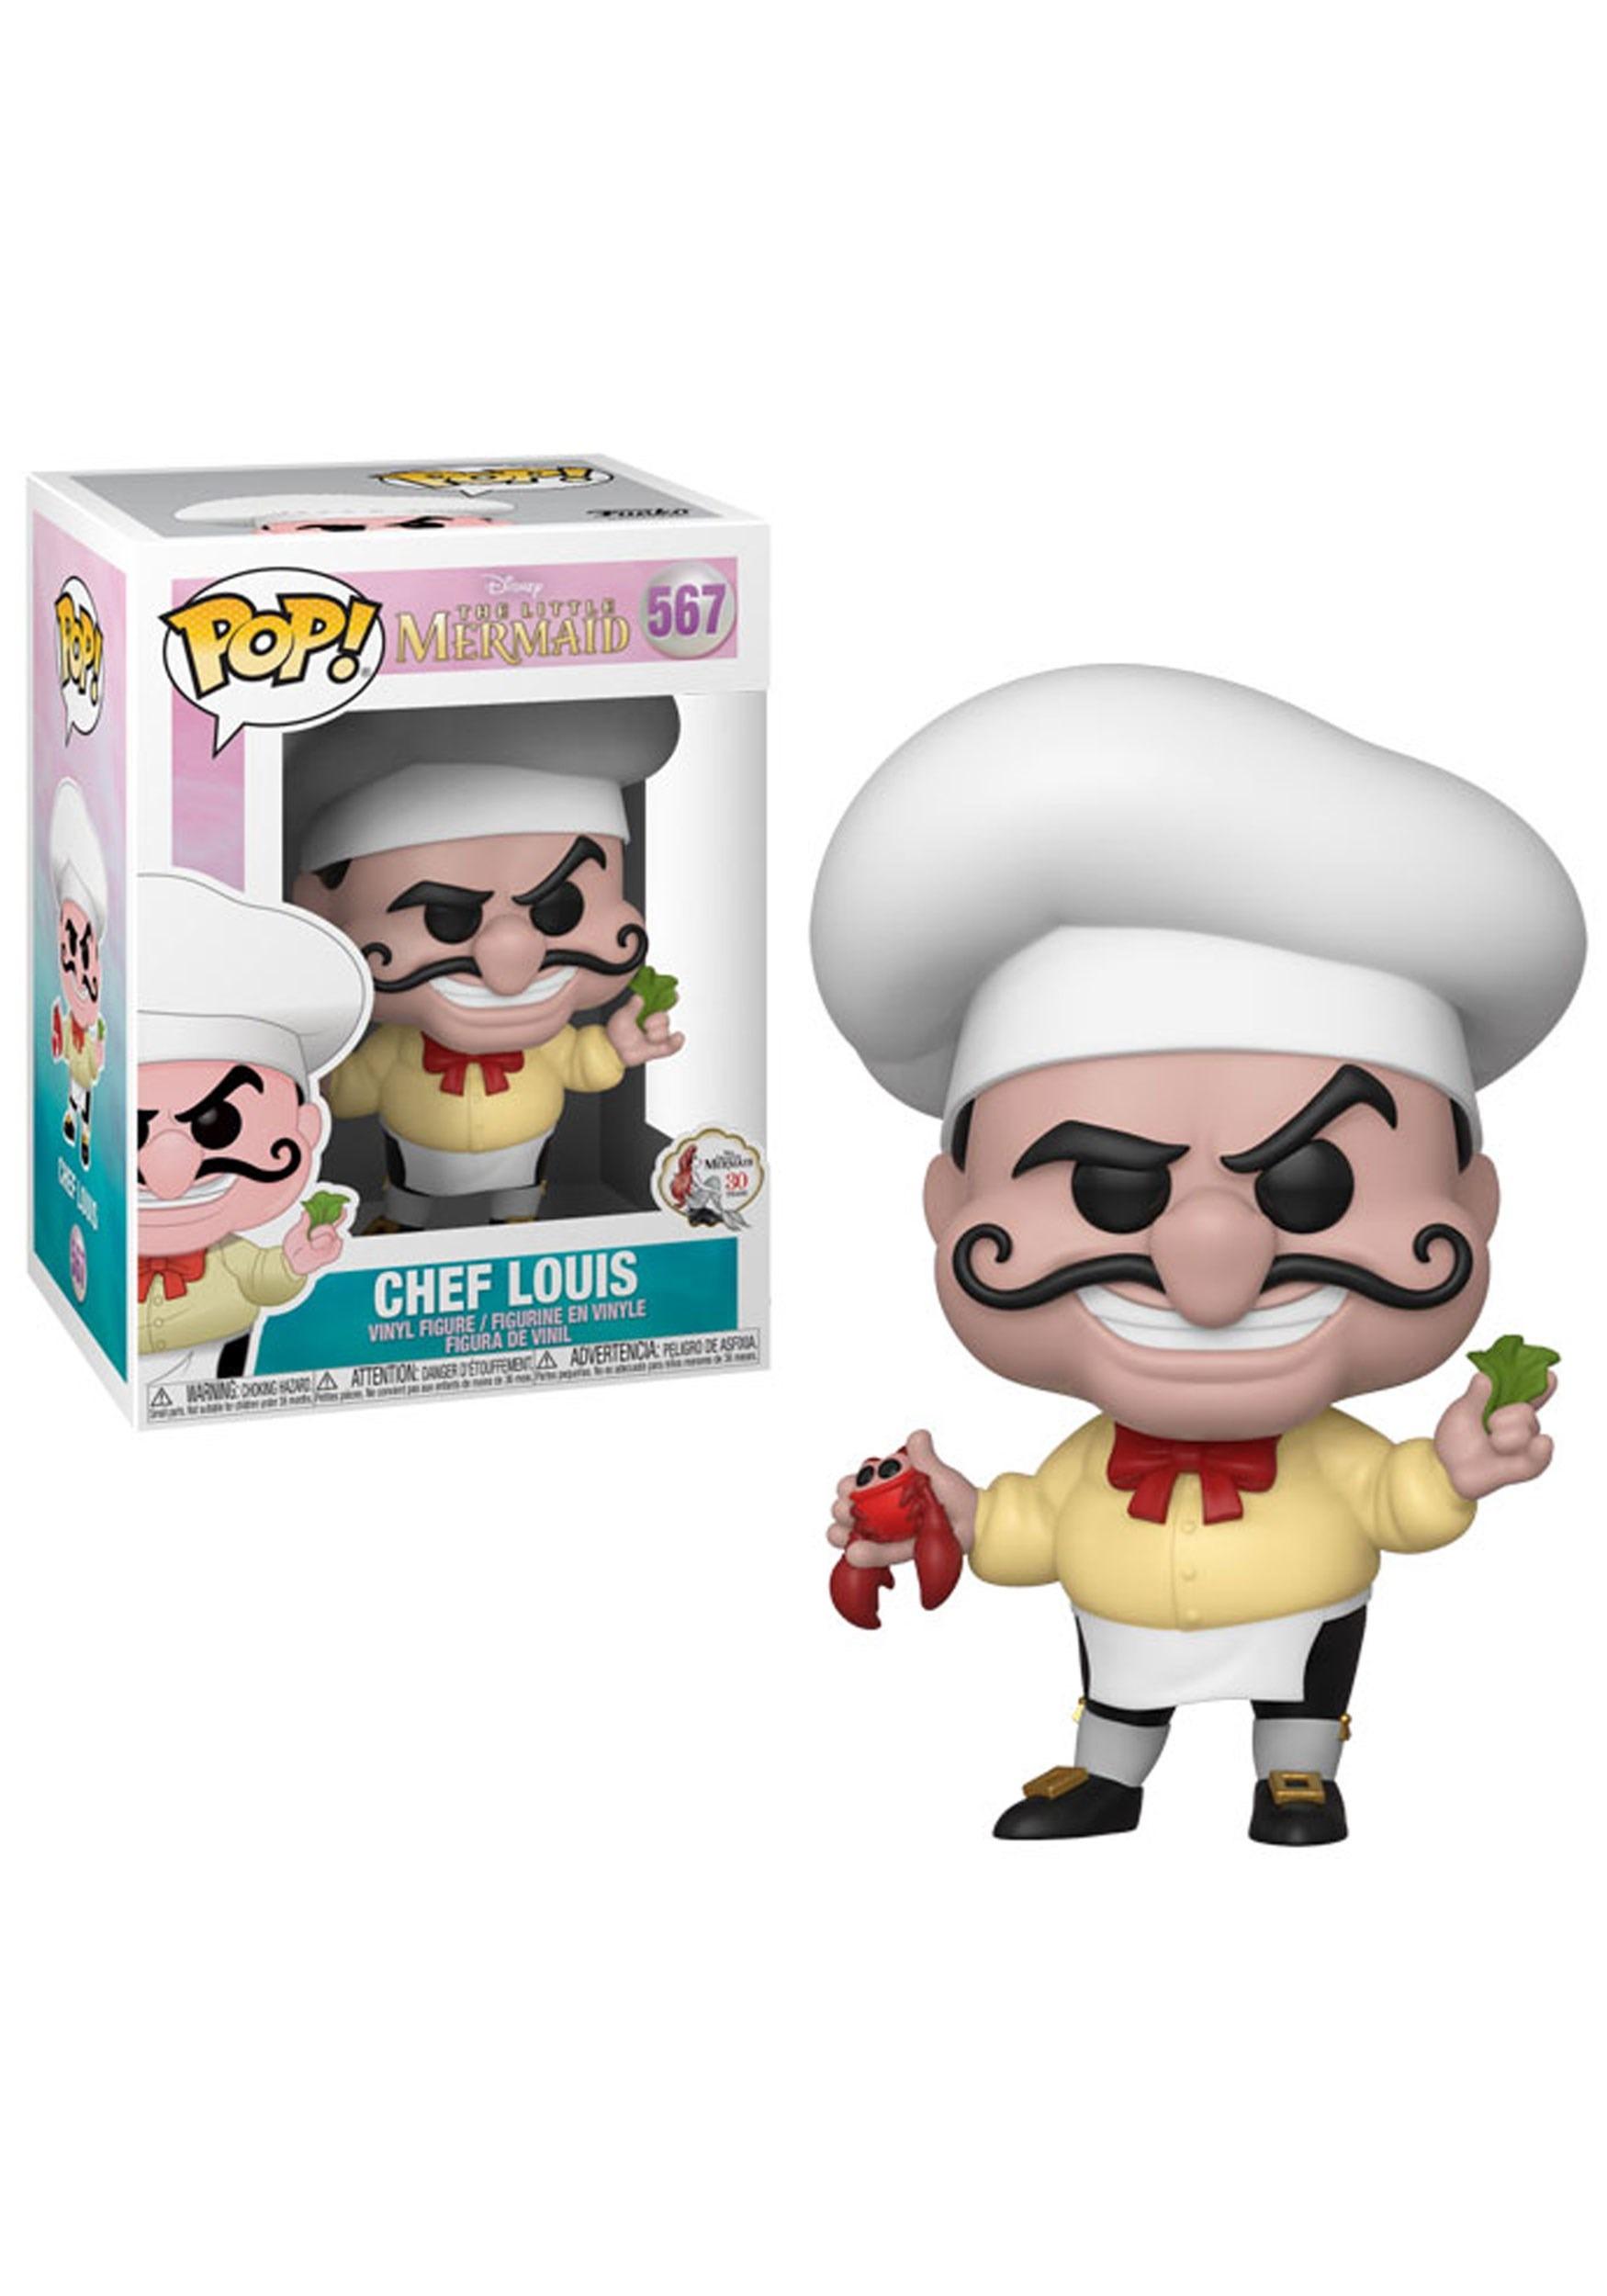 Pop Disney Little Mermaid Chef Louis Collectible